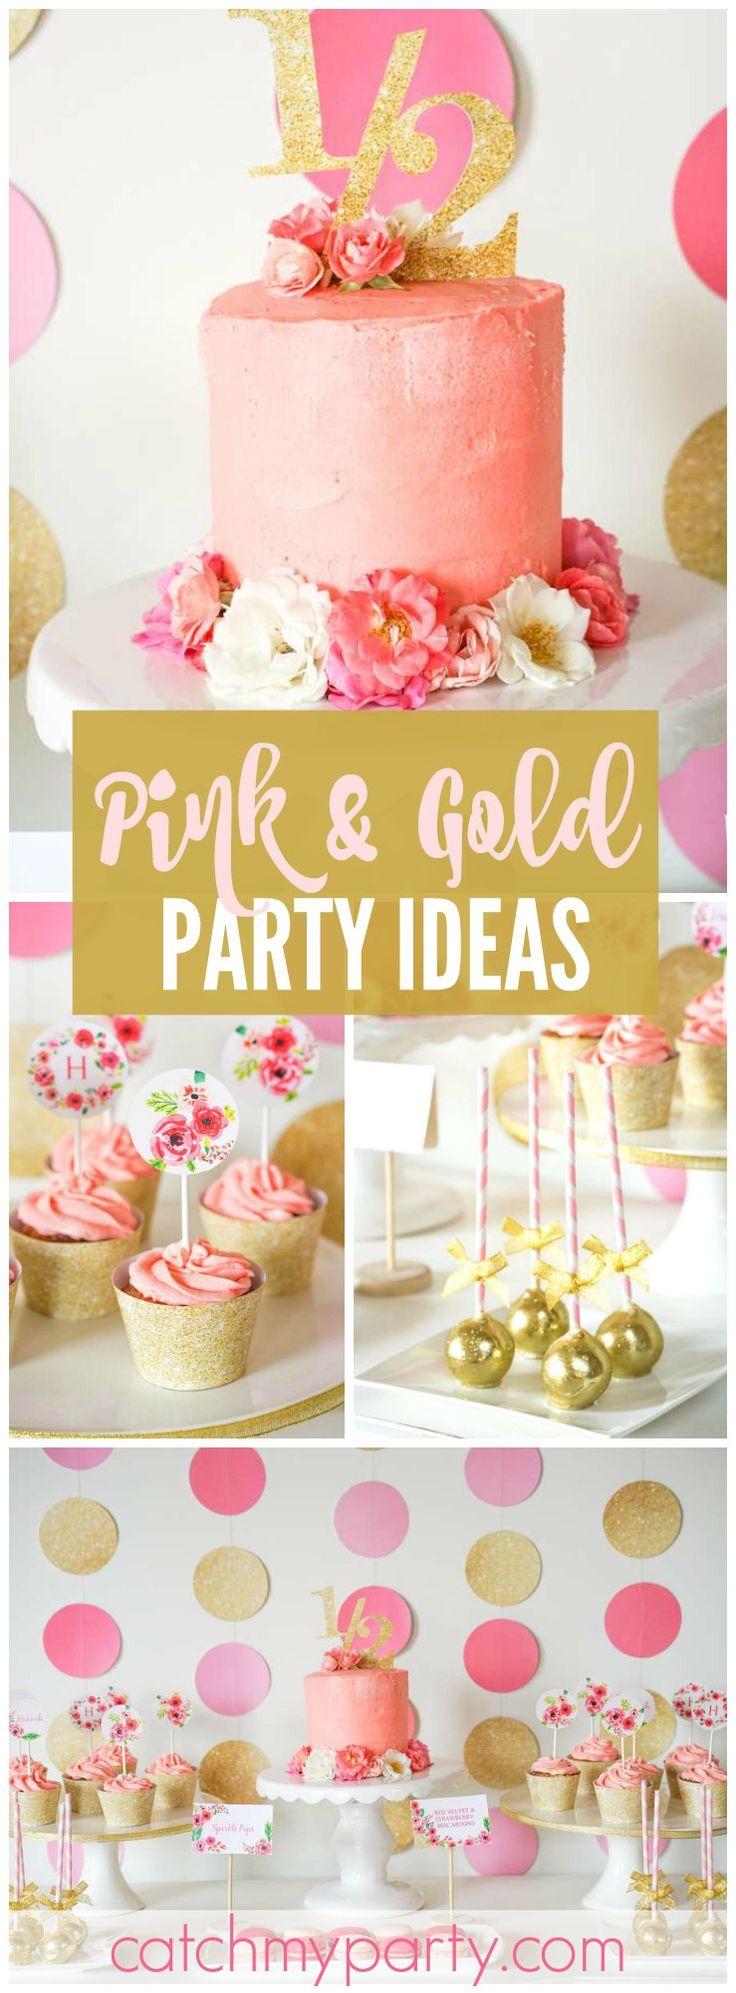 93 best First Birthday Parties images on Pinterest | Birthdays ...